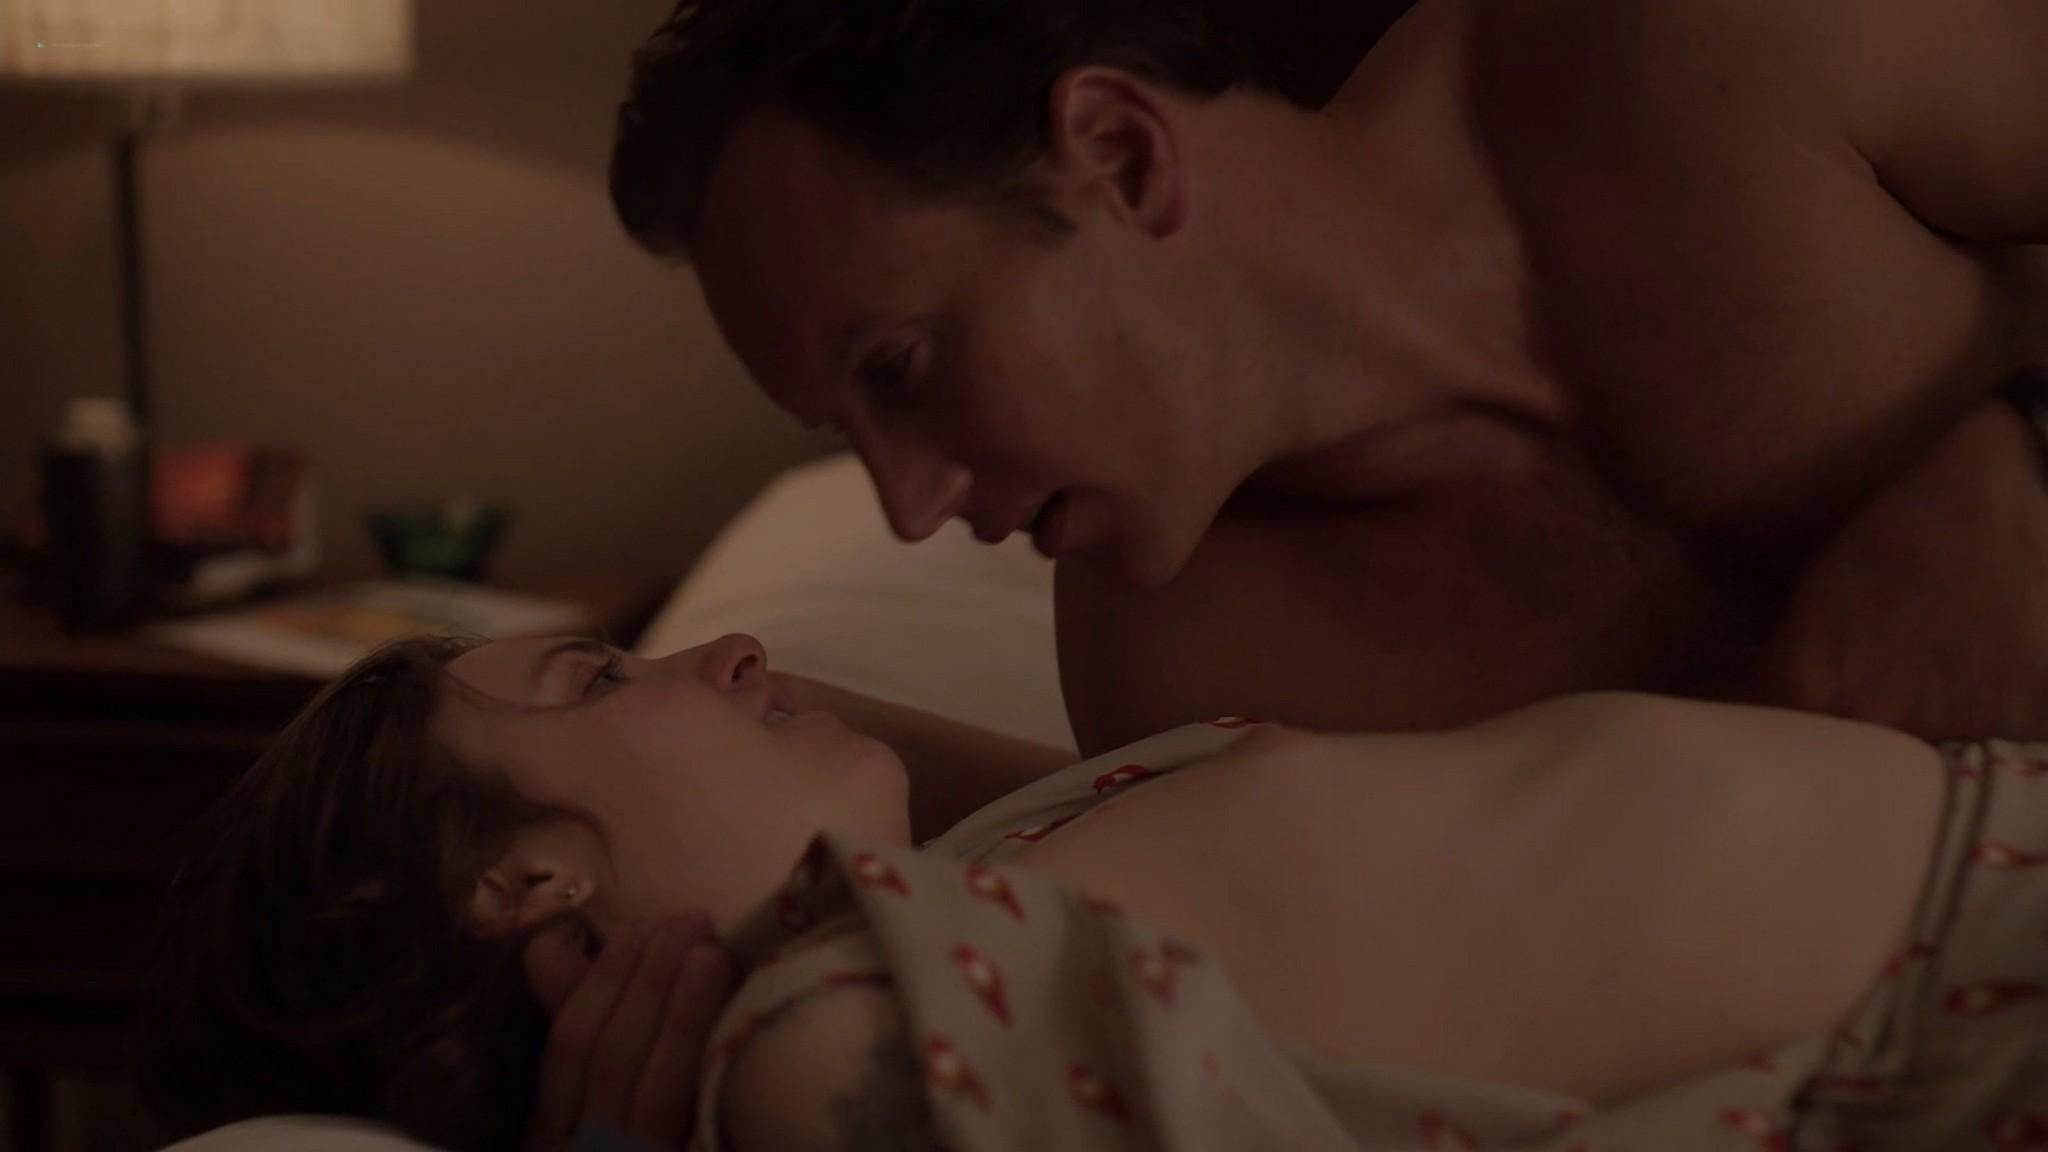 Allison Williams sex Lena Dunham nude Zosia Mamet hot Jemima Kirke nude Girls 2012 s2e1 5 1080p Web 16